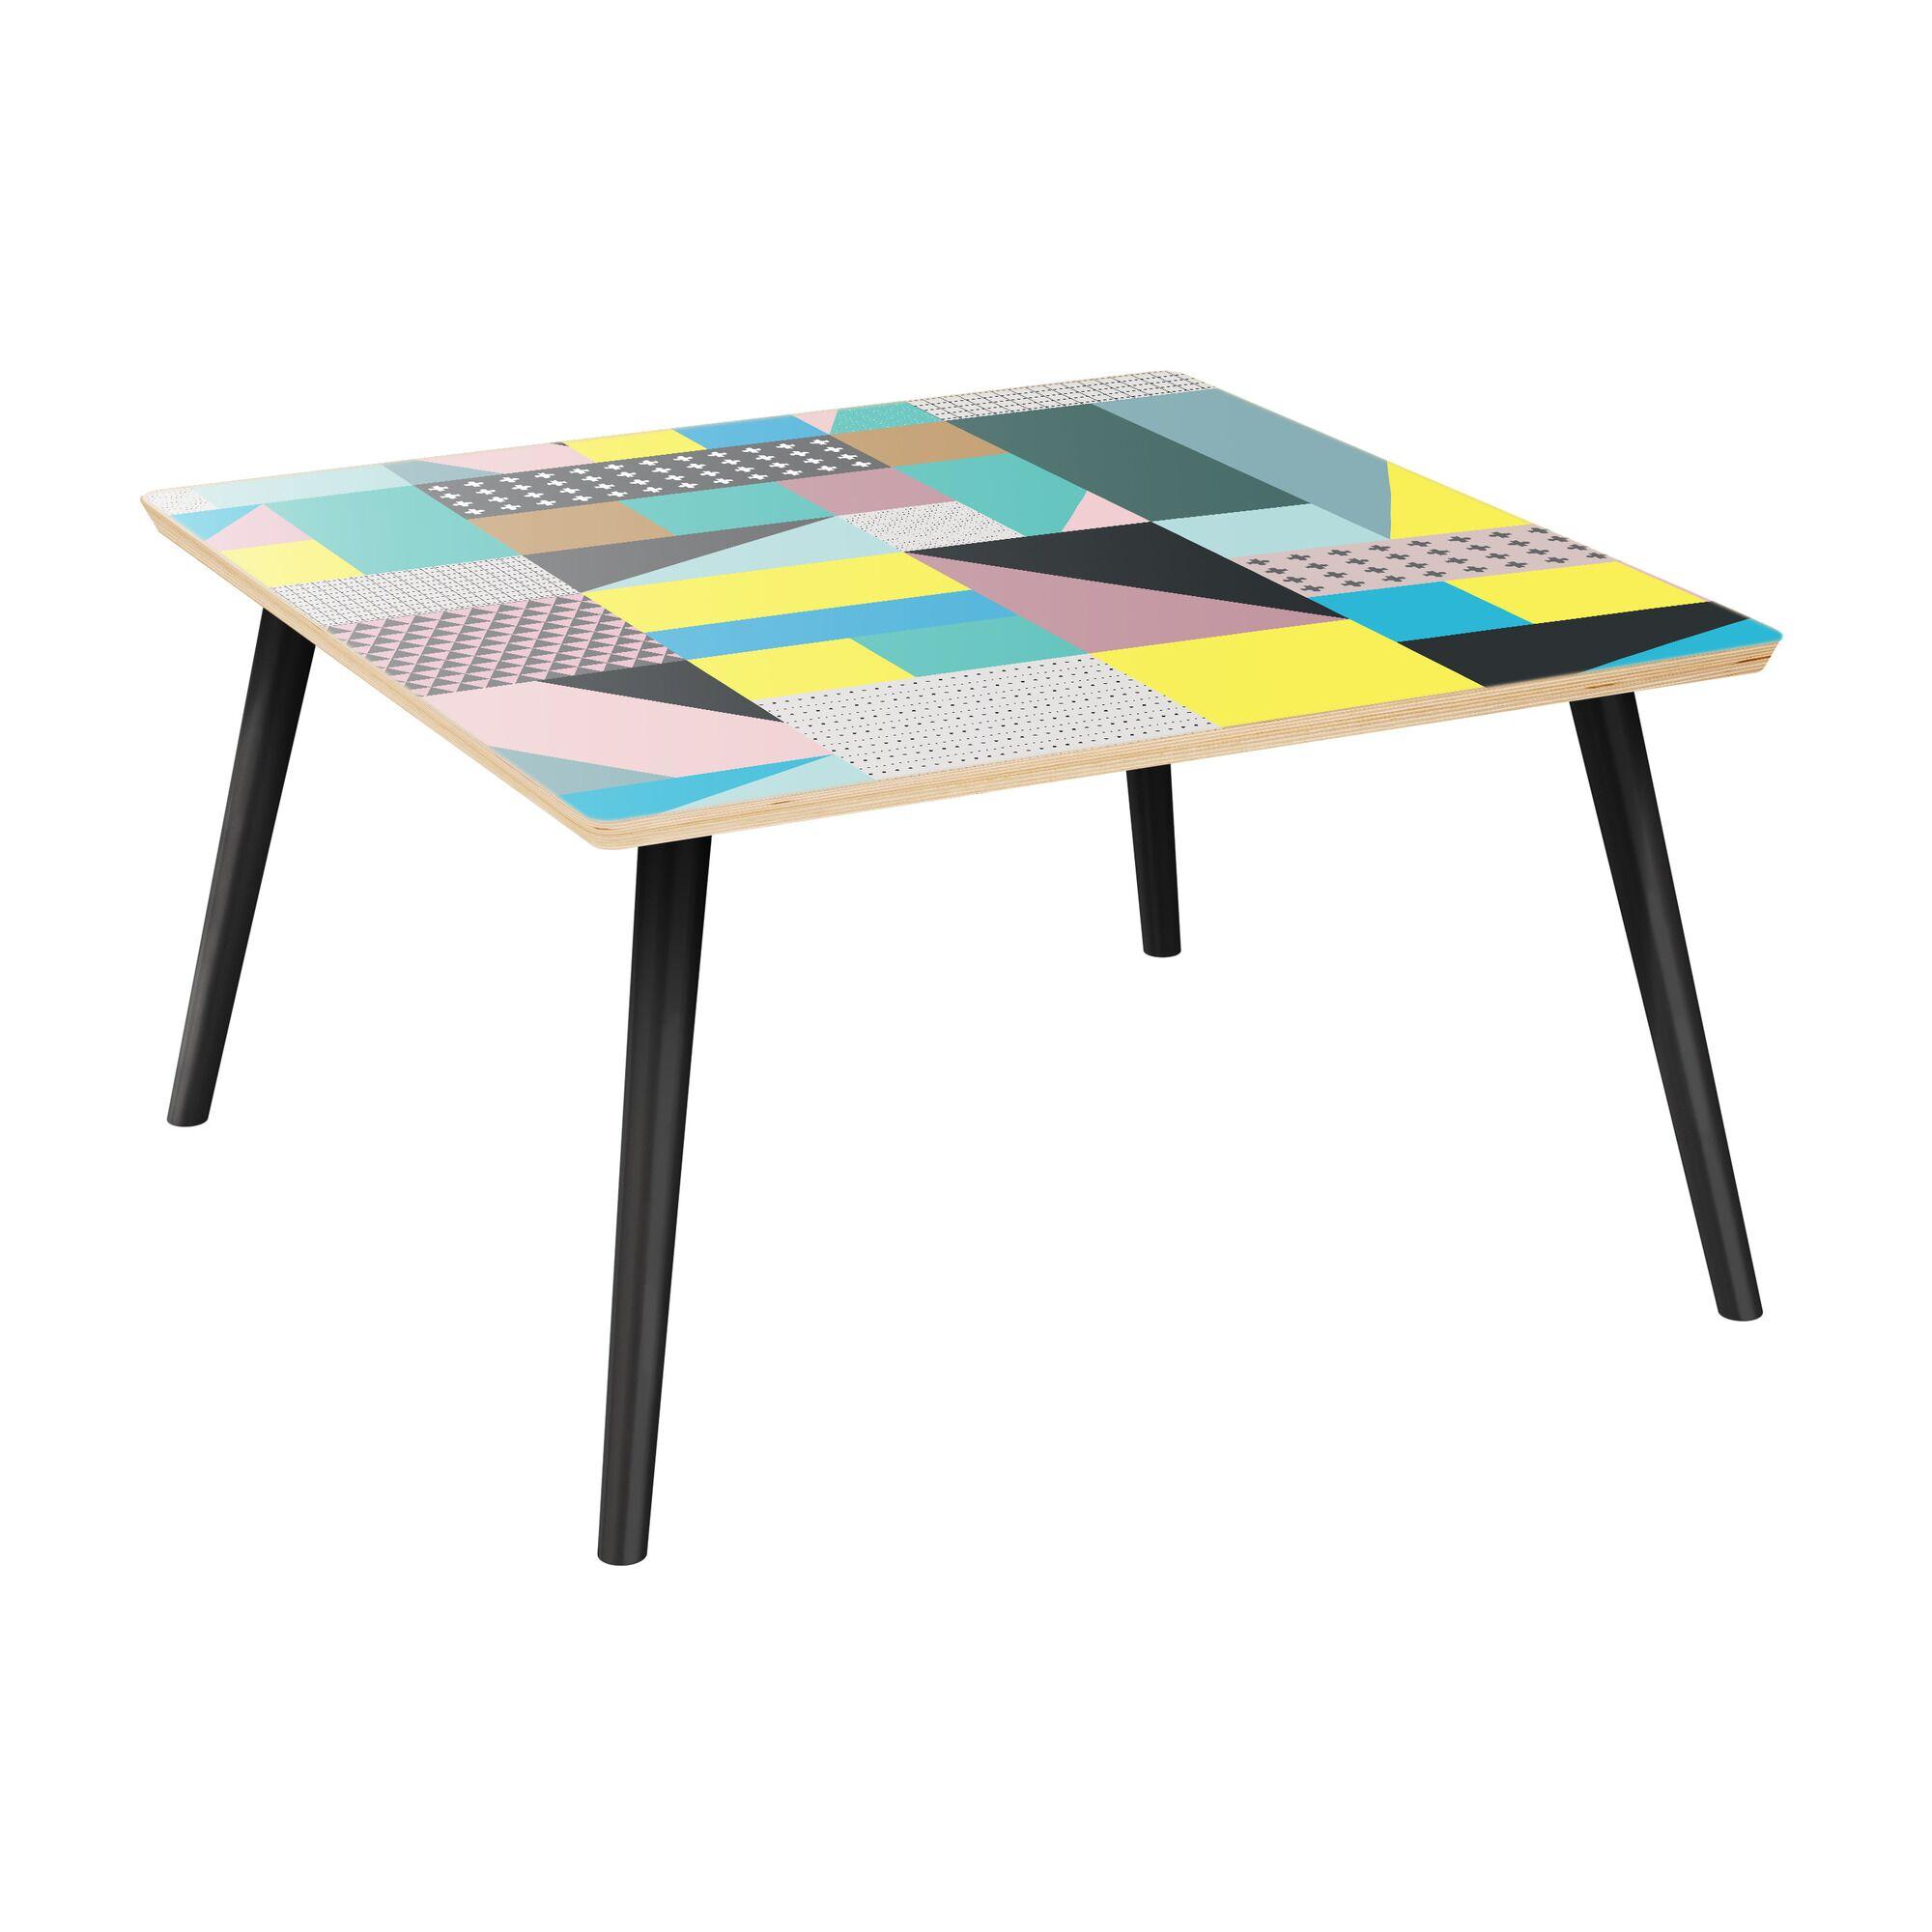 Joya Coffee Table Table Top Color: Natural, Table Base Color: Black